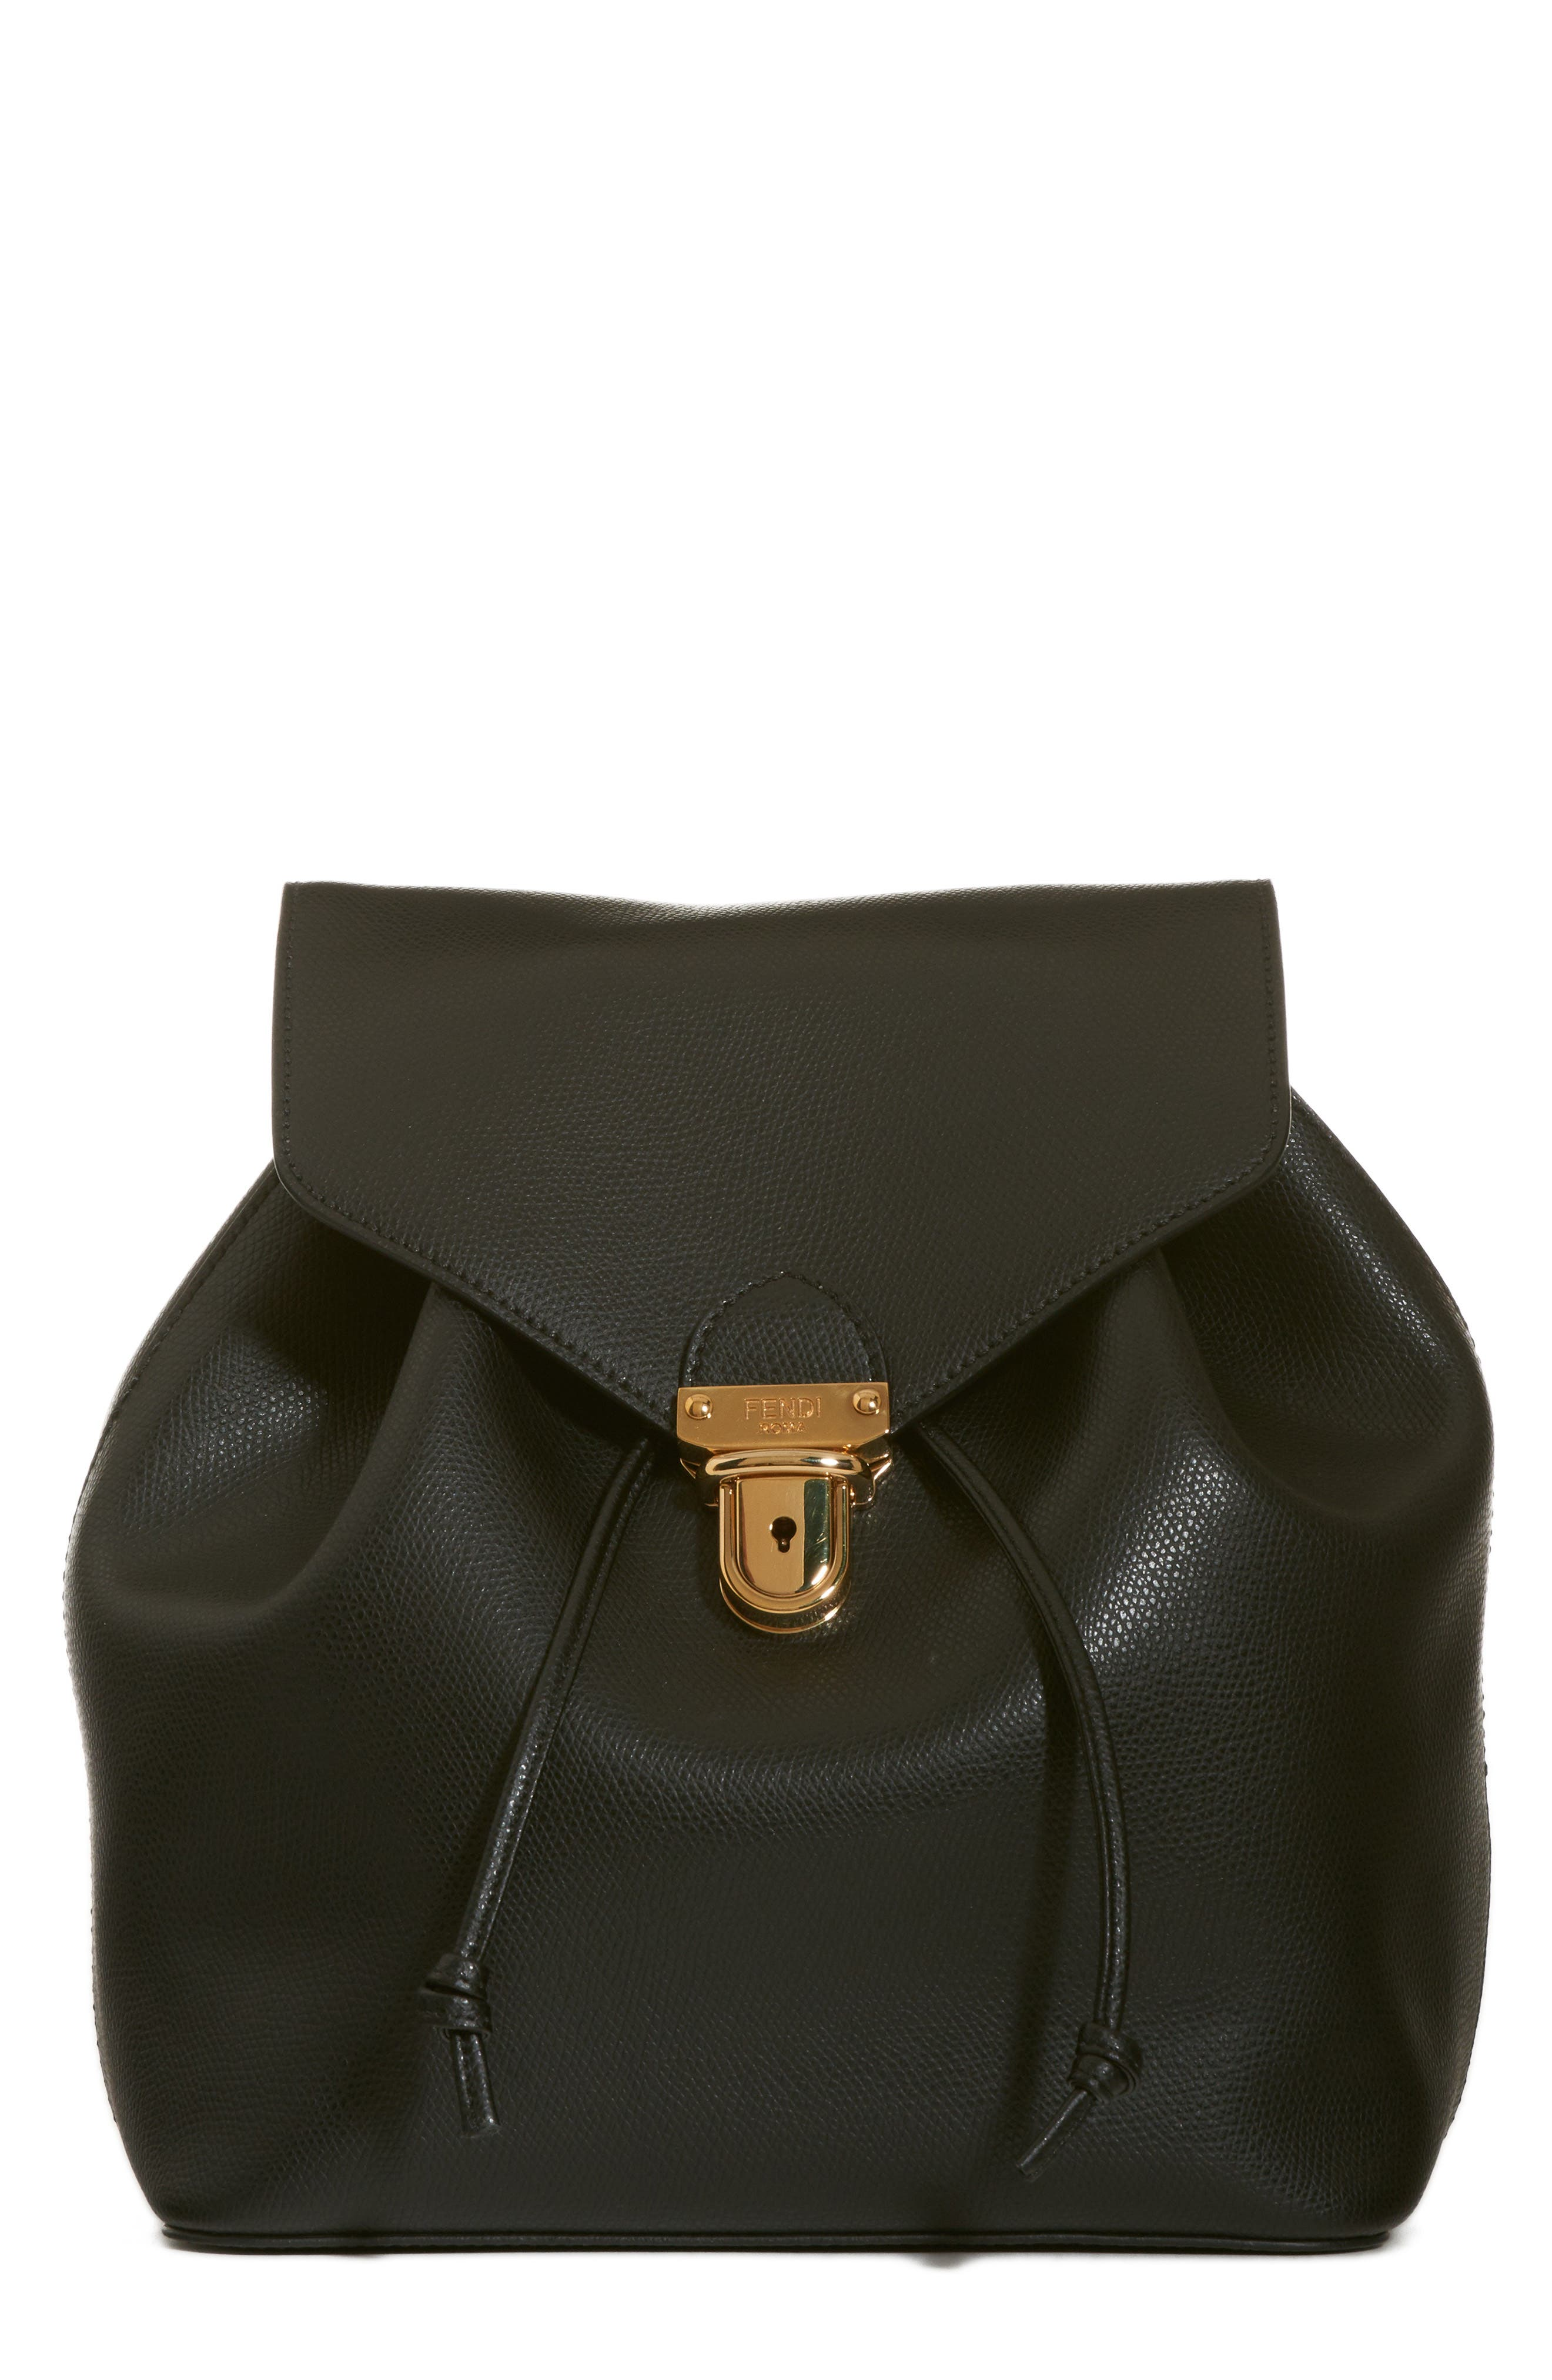 FENDI,                             Cruise Calfskin Leather Backpack,                             Main thumbnail 1, color,                             006